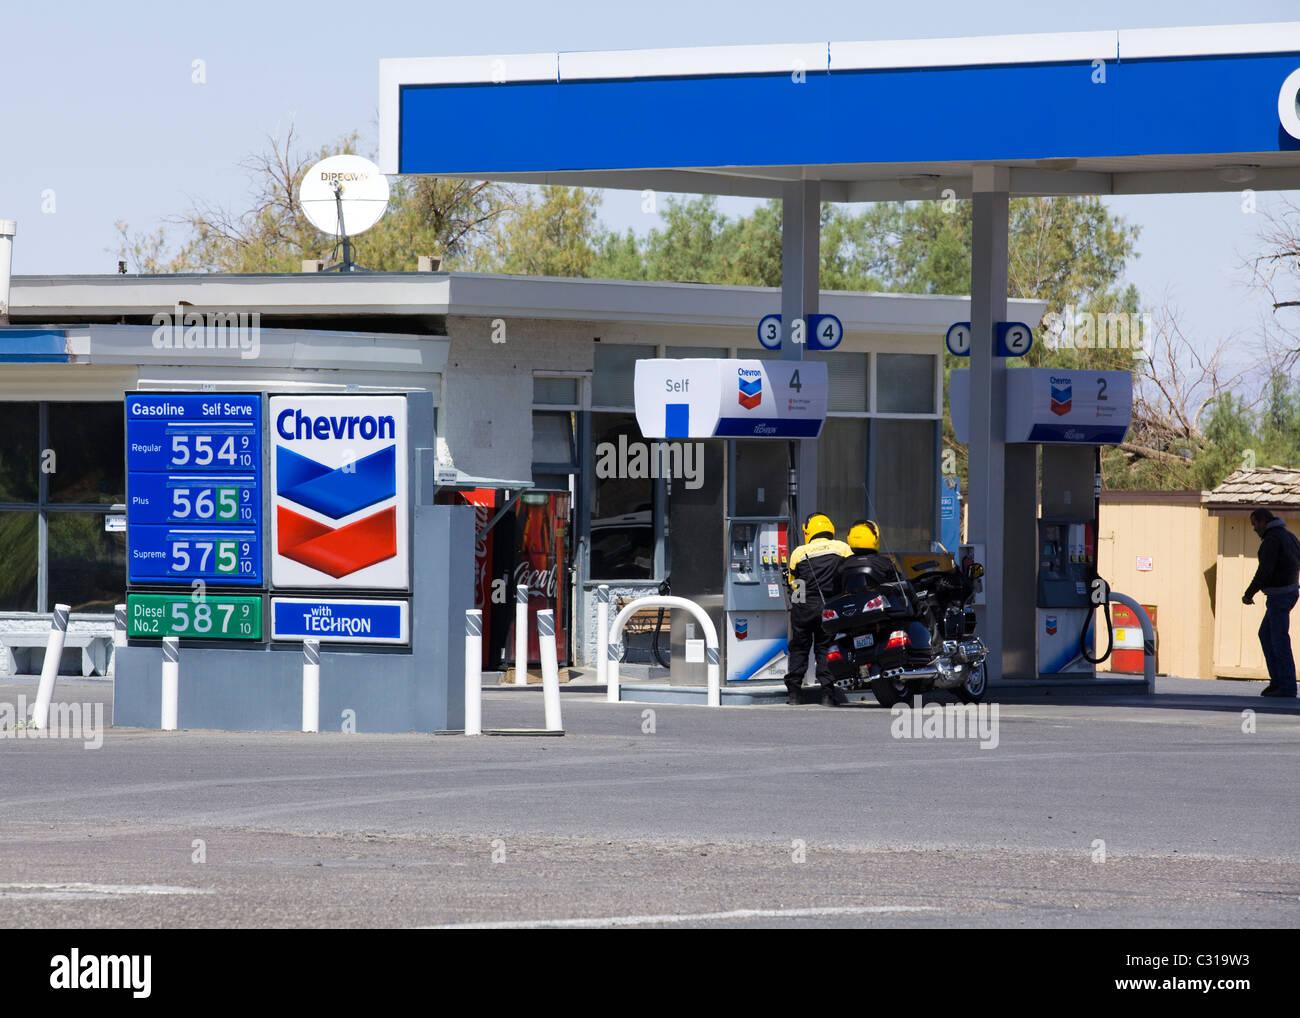 High petrol price sign, California, USA - Stock Image